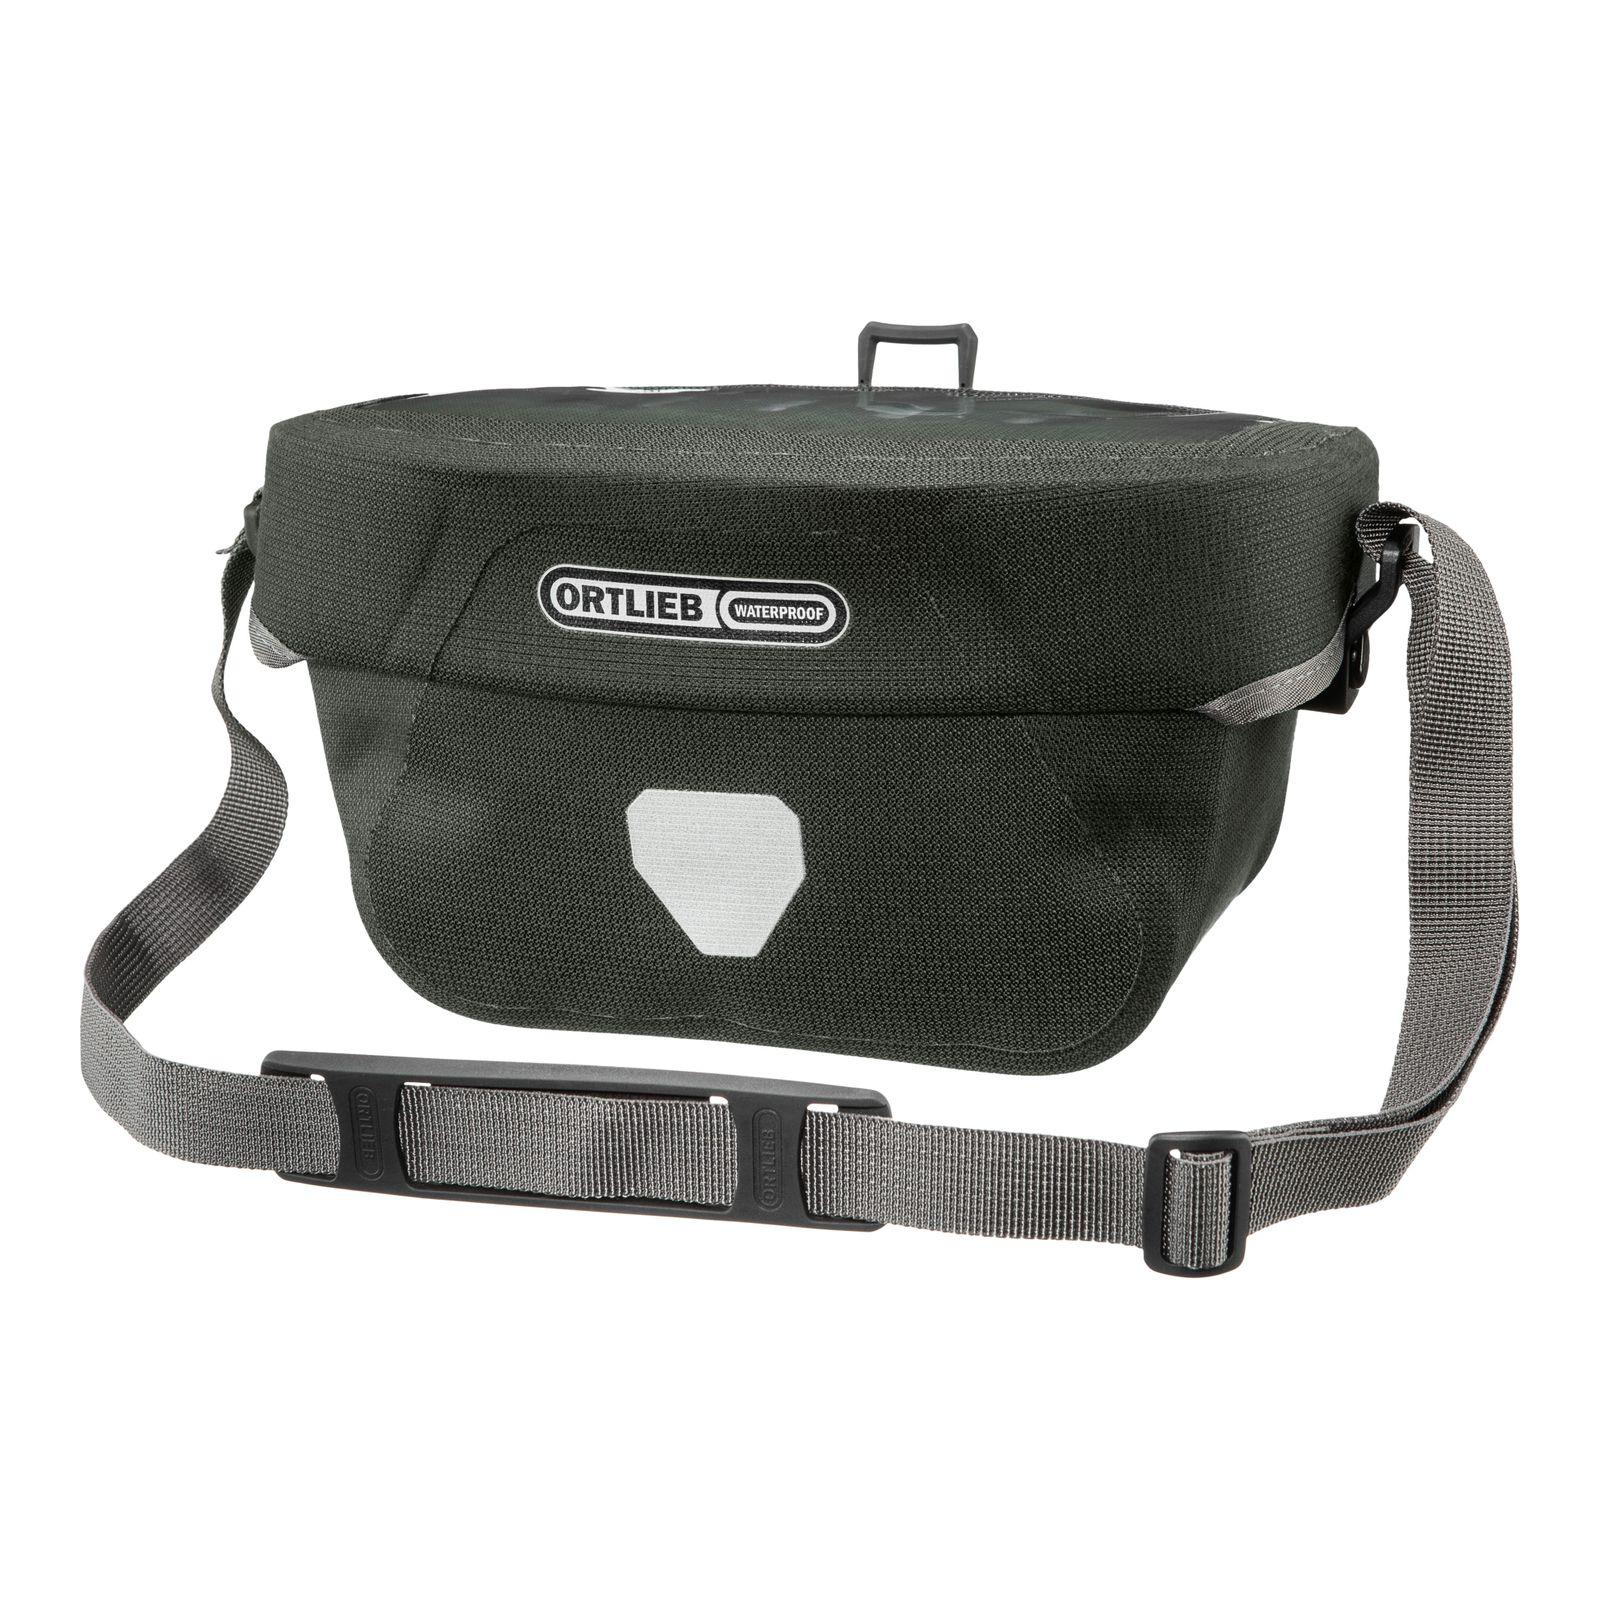 ORTLIEB Urban Ultimate Six Handlebar Bag 5L Pine